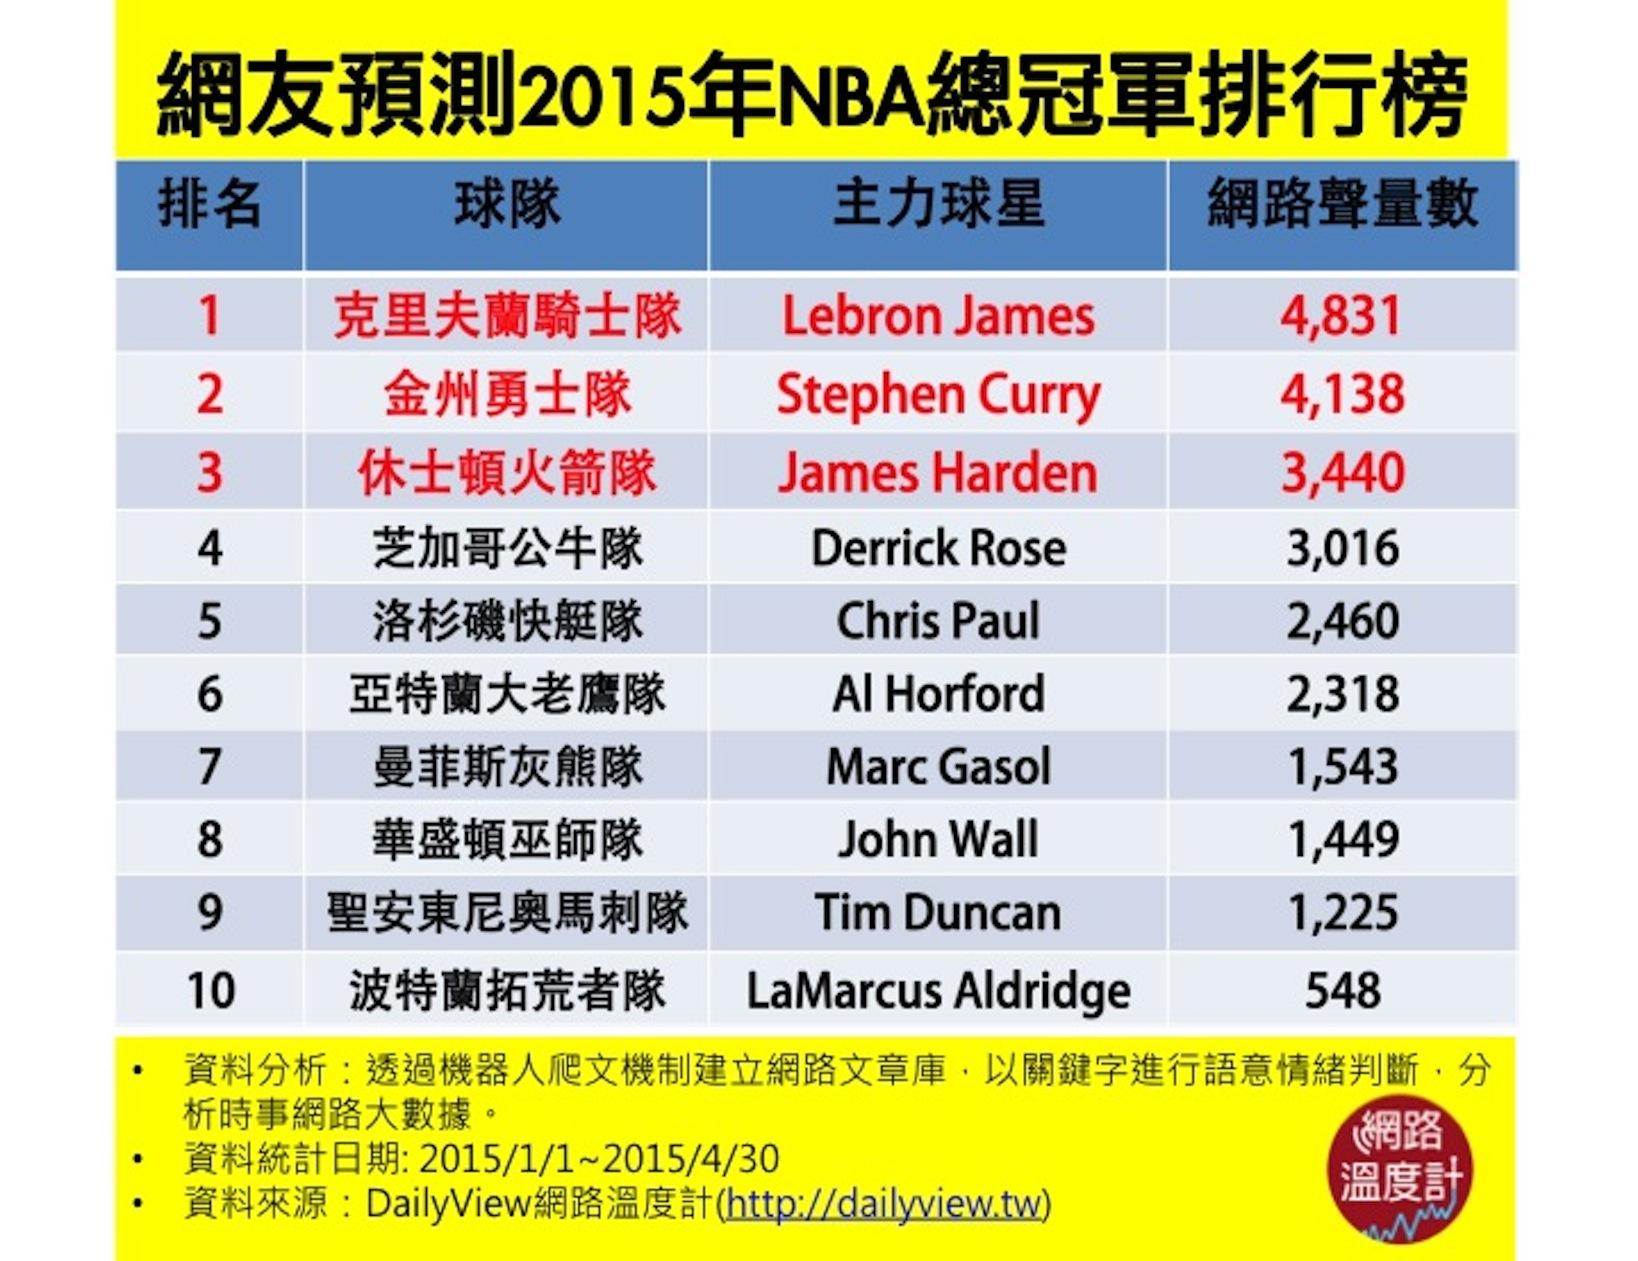 NBA RANKING